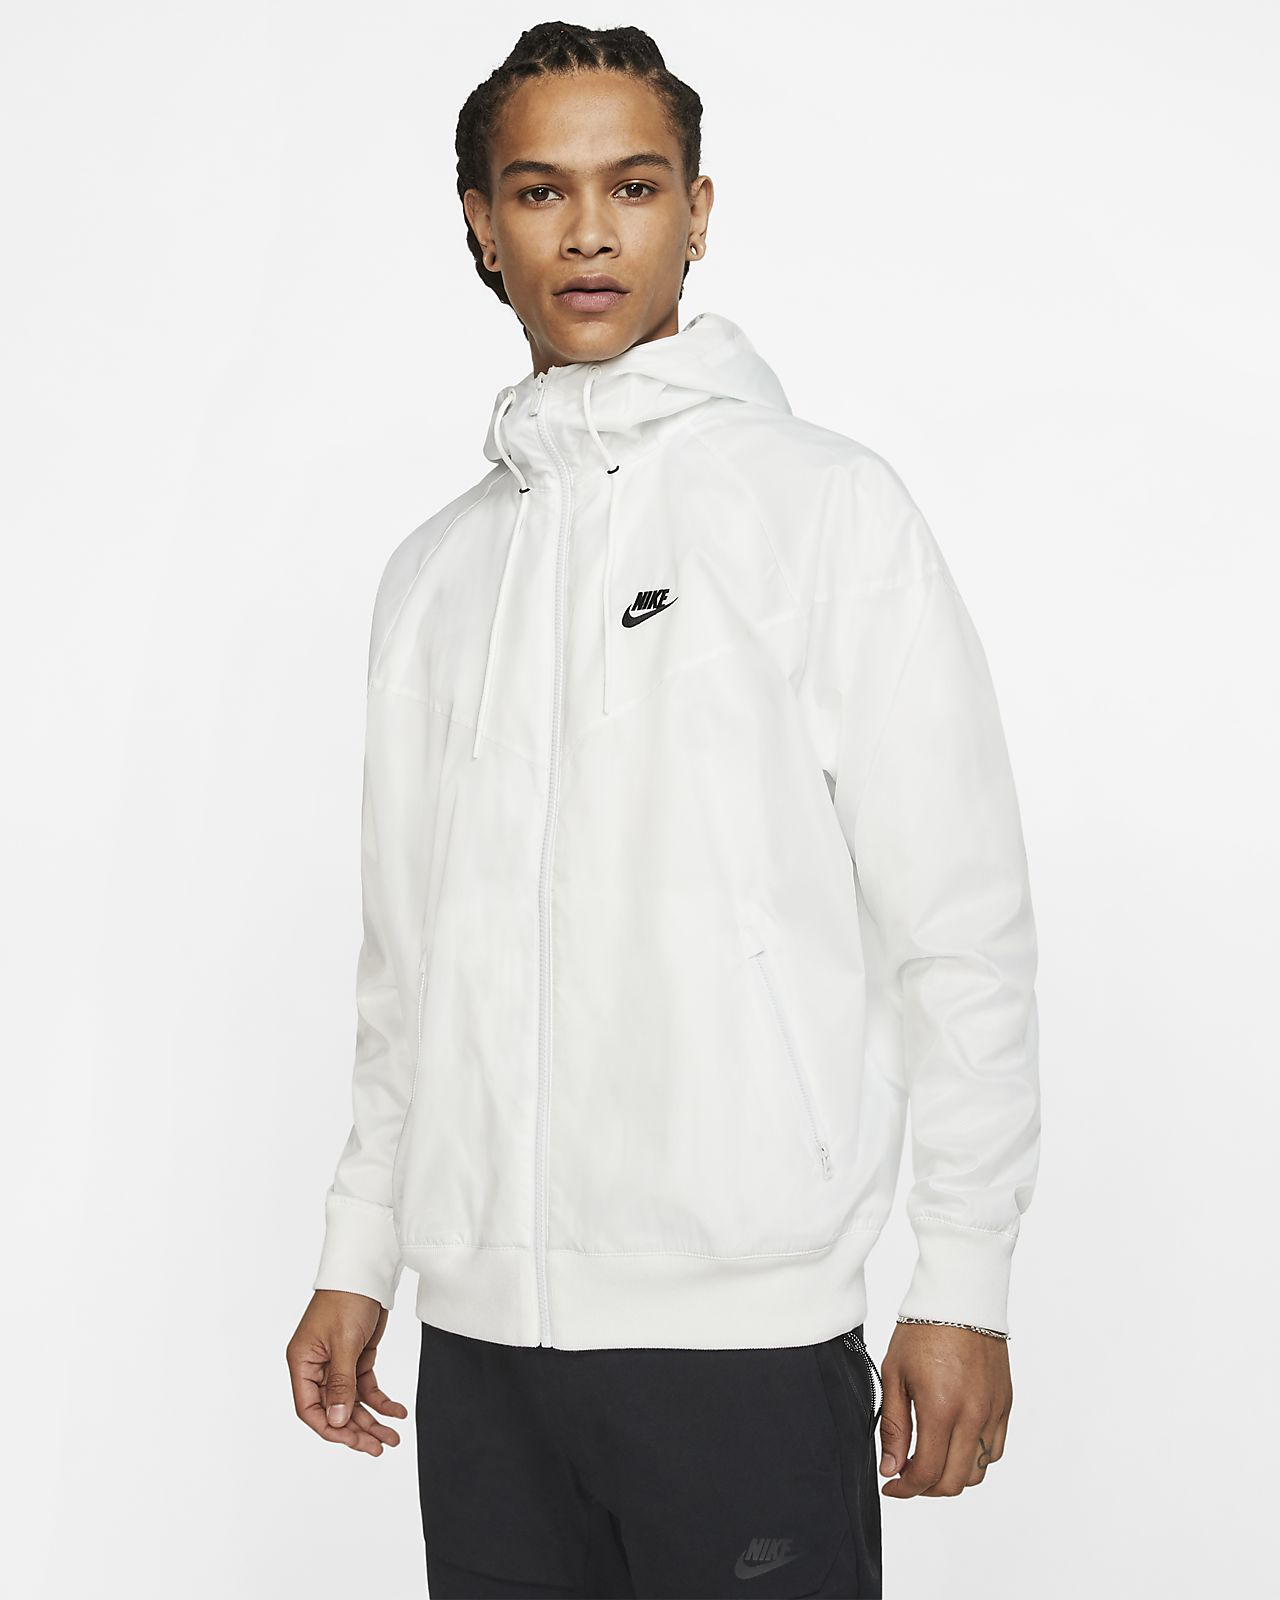 Nike Sportswear Windrunner White | GetInspired.no